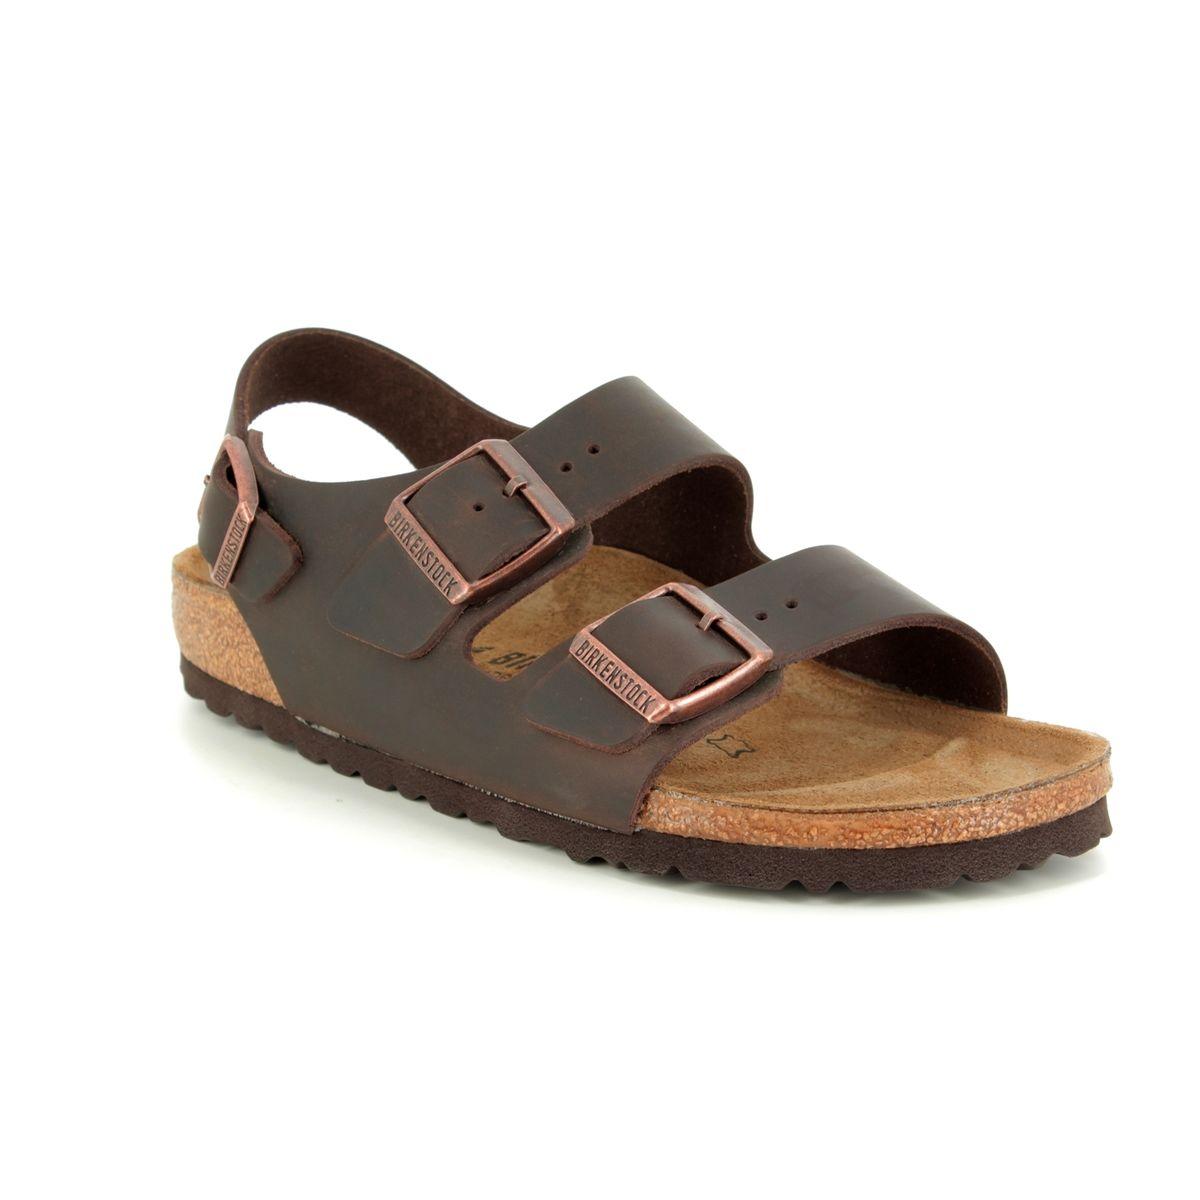 c38940fb5da5 Birkenstock Sandals - Brown leather - 0034873 MILANO HABANA OILED LEATHER